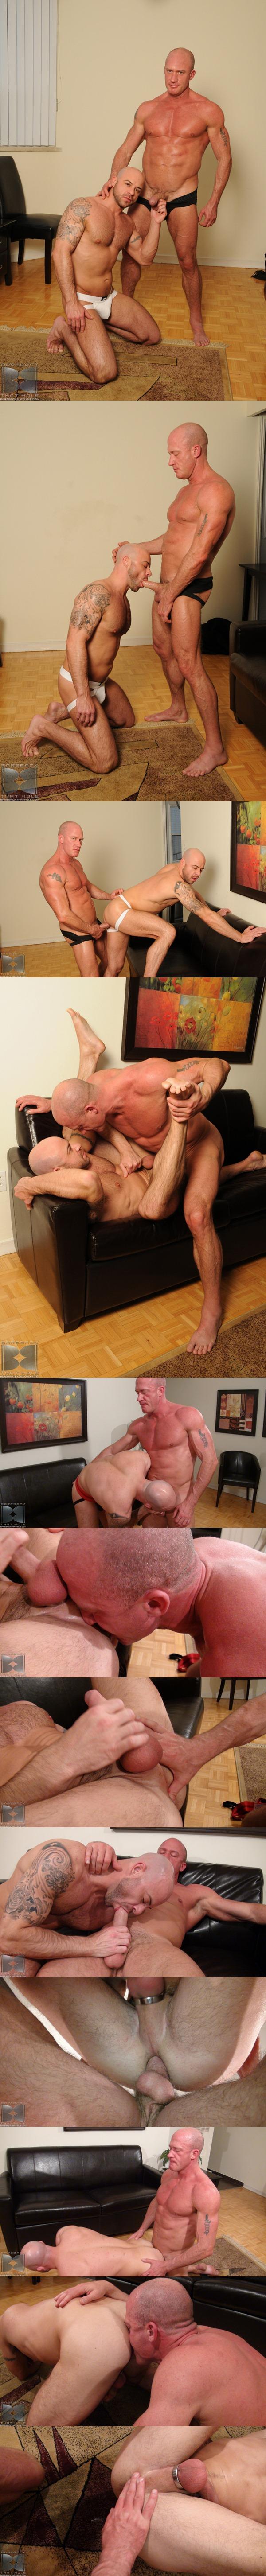 Daddy Jake Norris raw fucks and breeds muscular Ben Statham 01 at Barebackthathole 02